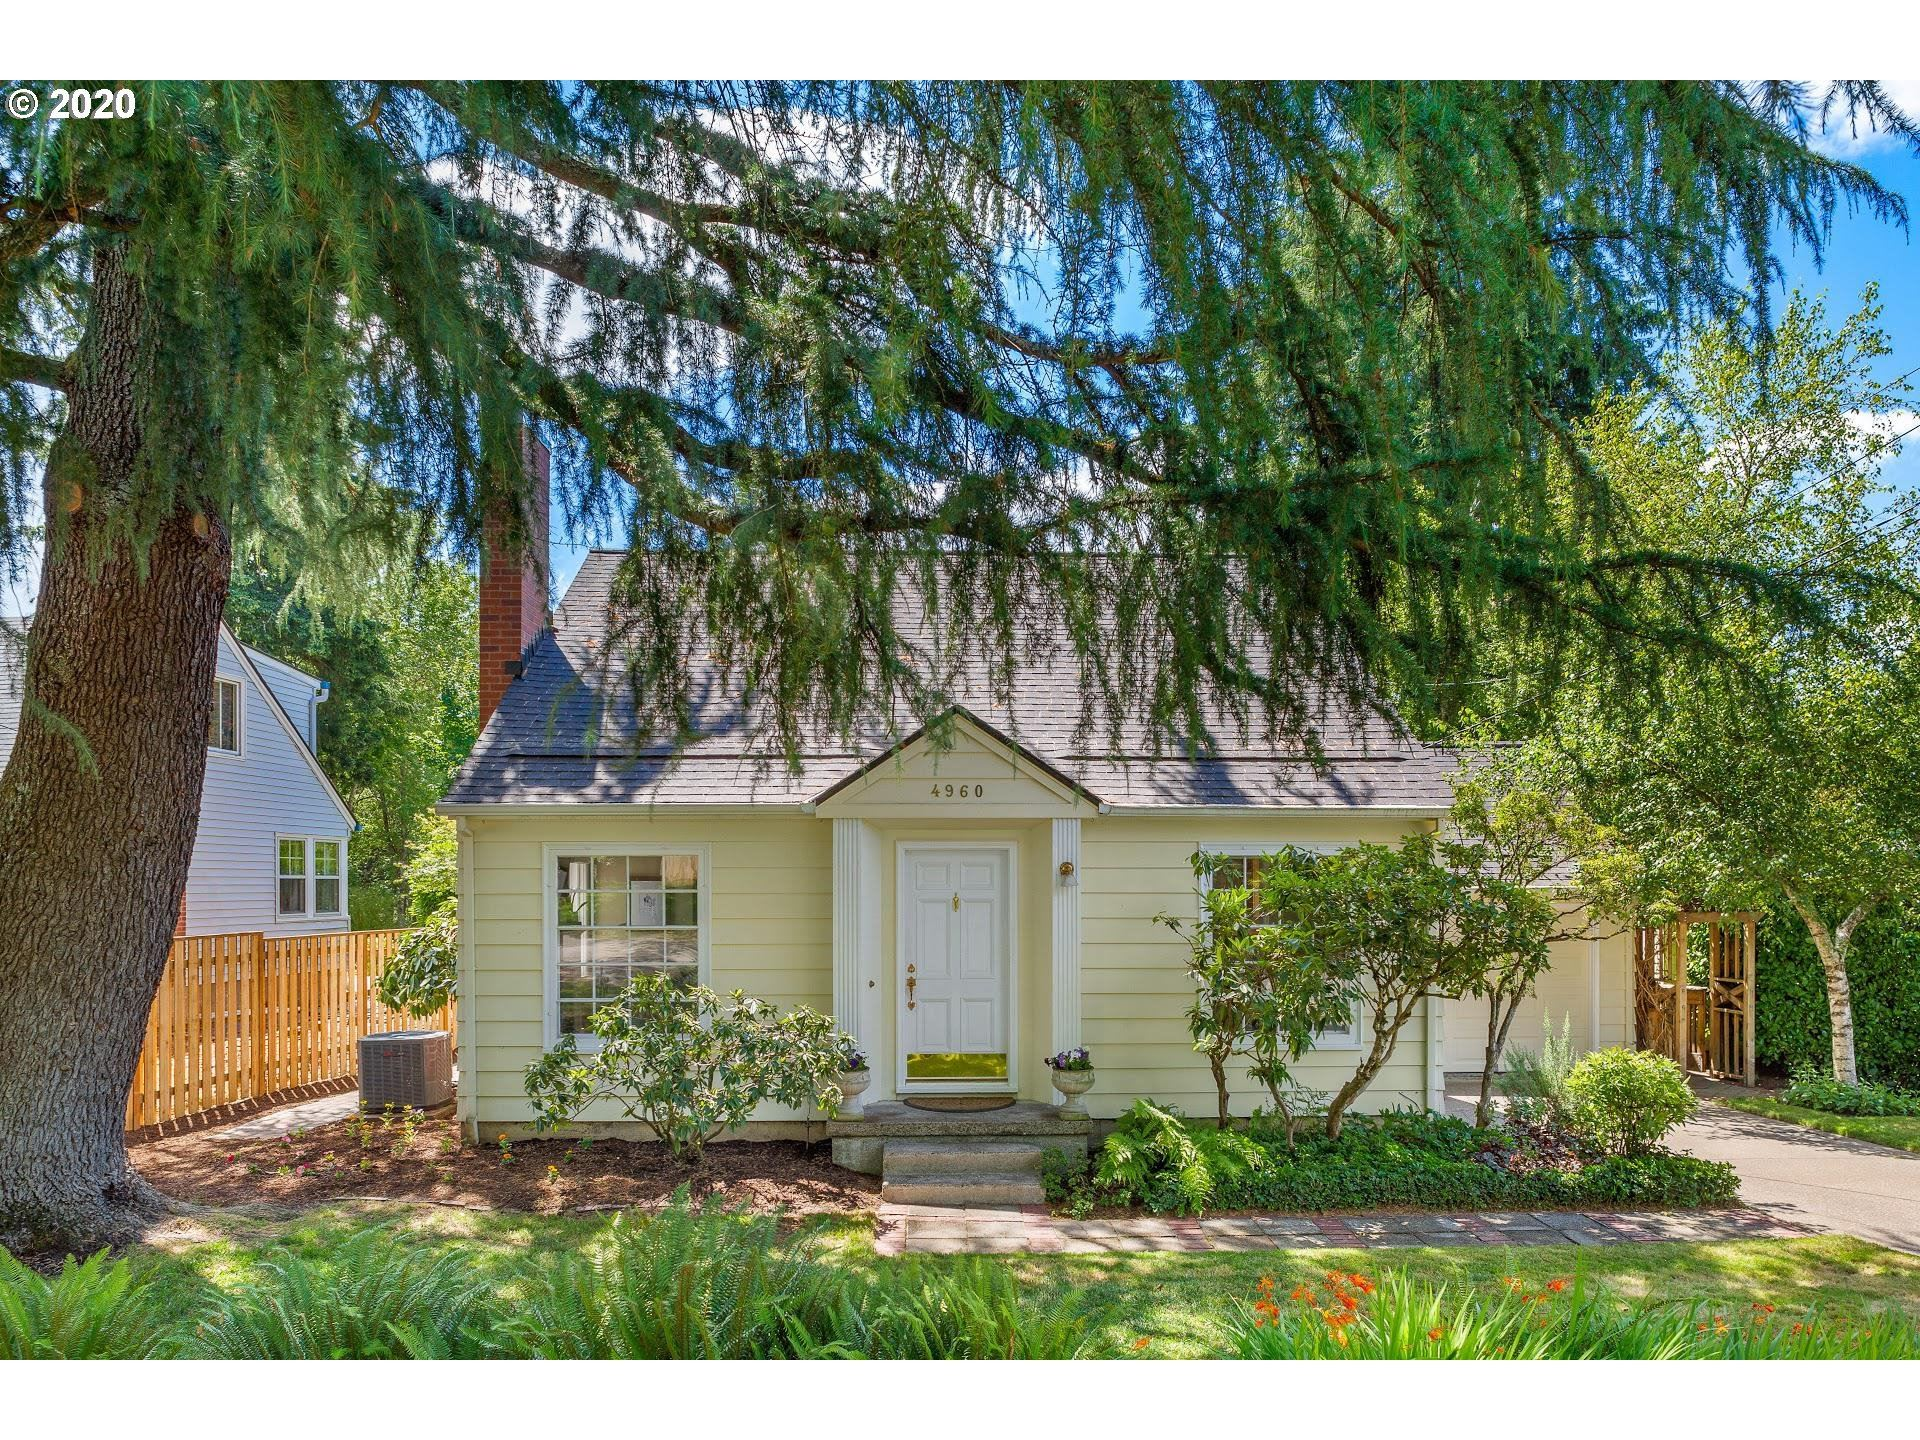 4960 SW 31ST DR, Portland, OR 97239 - MLS#: 20147402